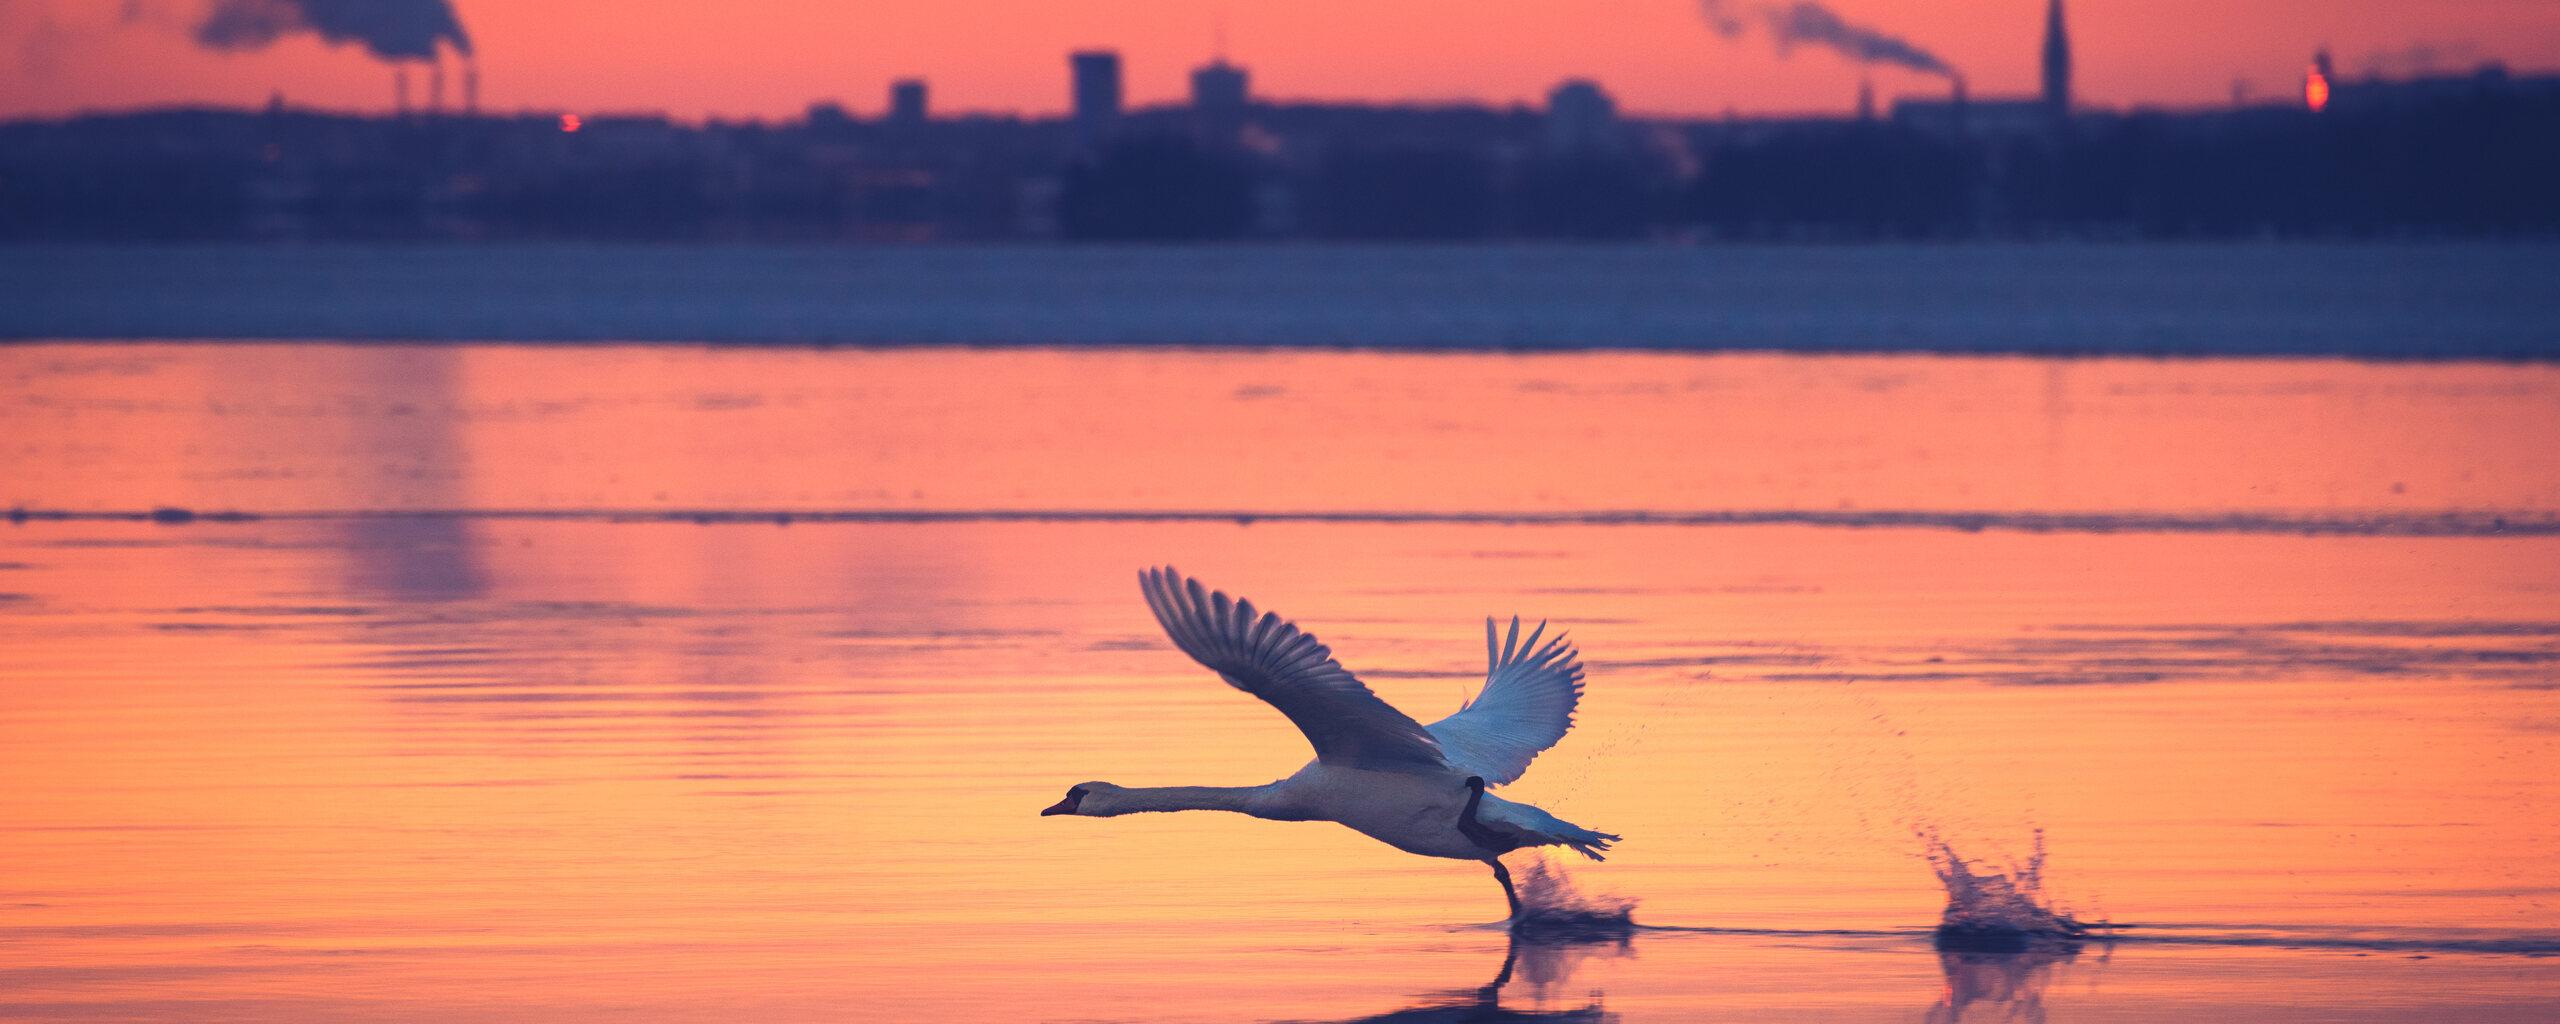 swan-take-off-yv.jpg